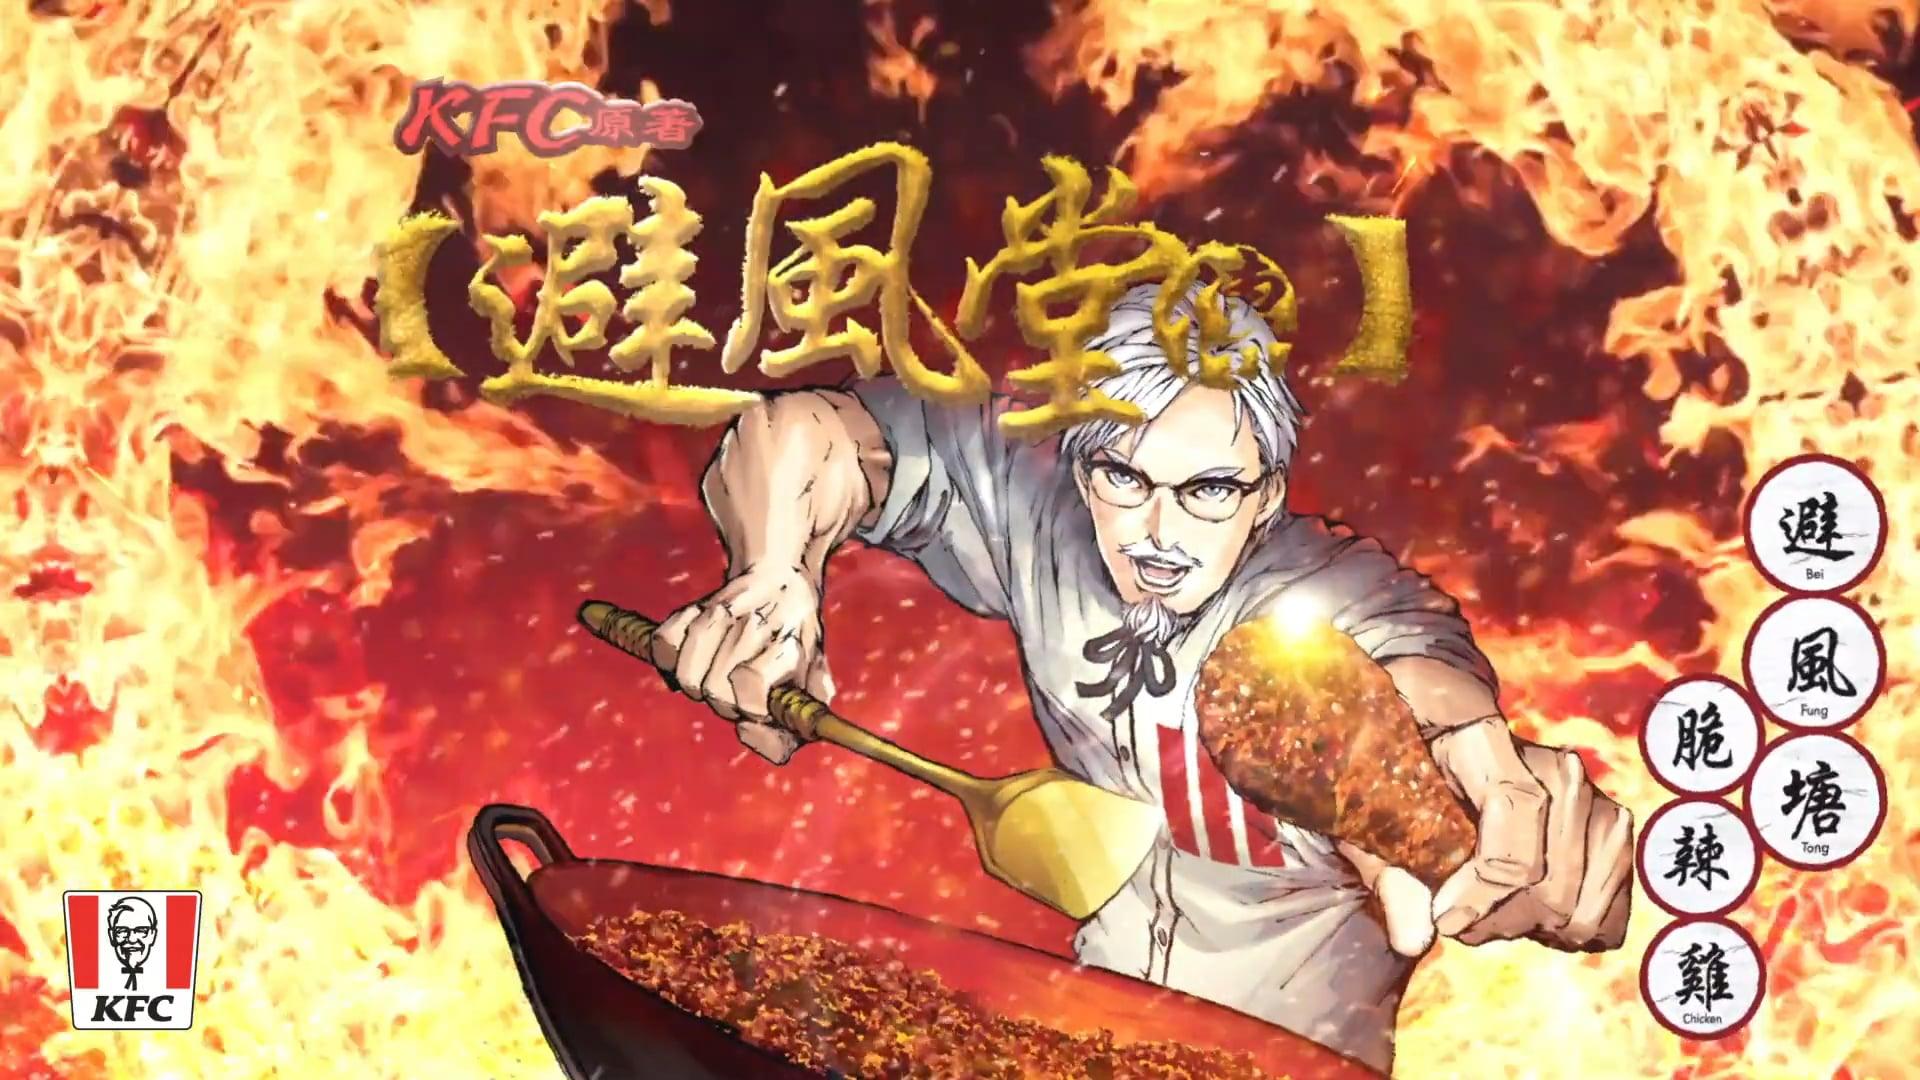 KFC 避風塘炸雞 Promo (vol2)